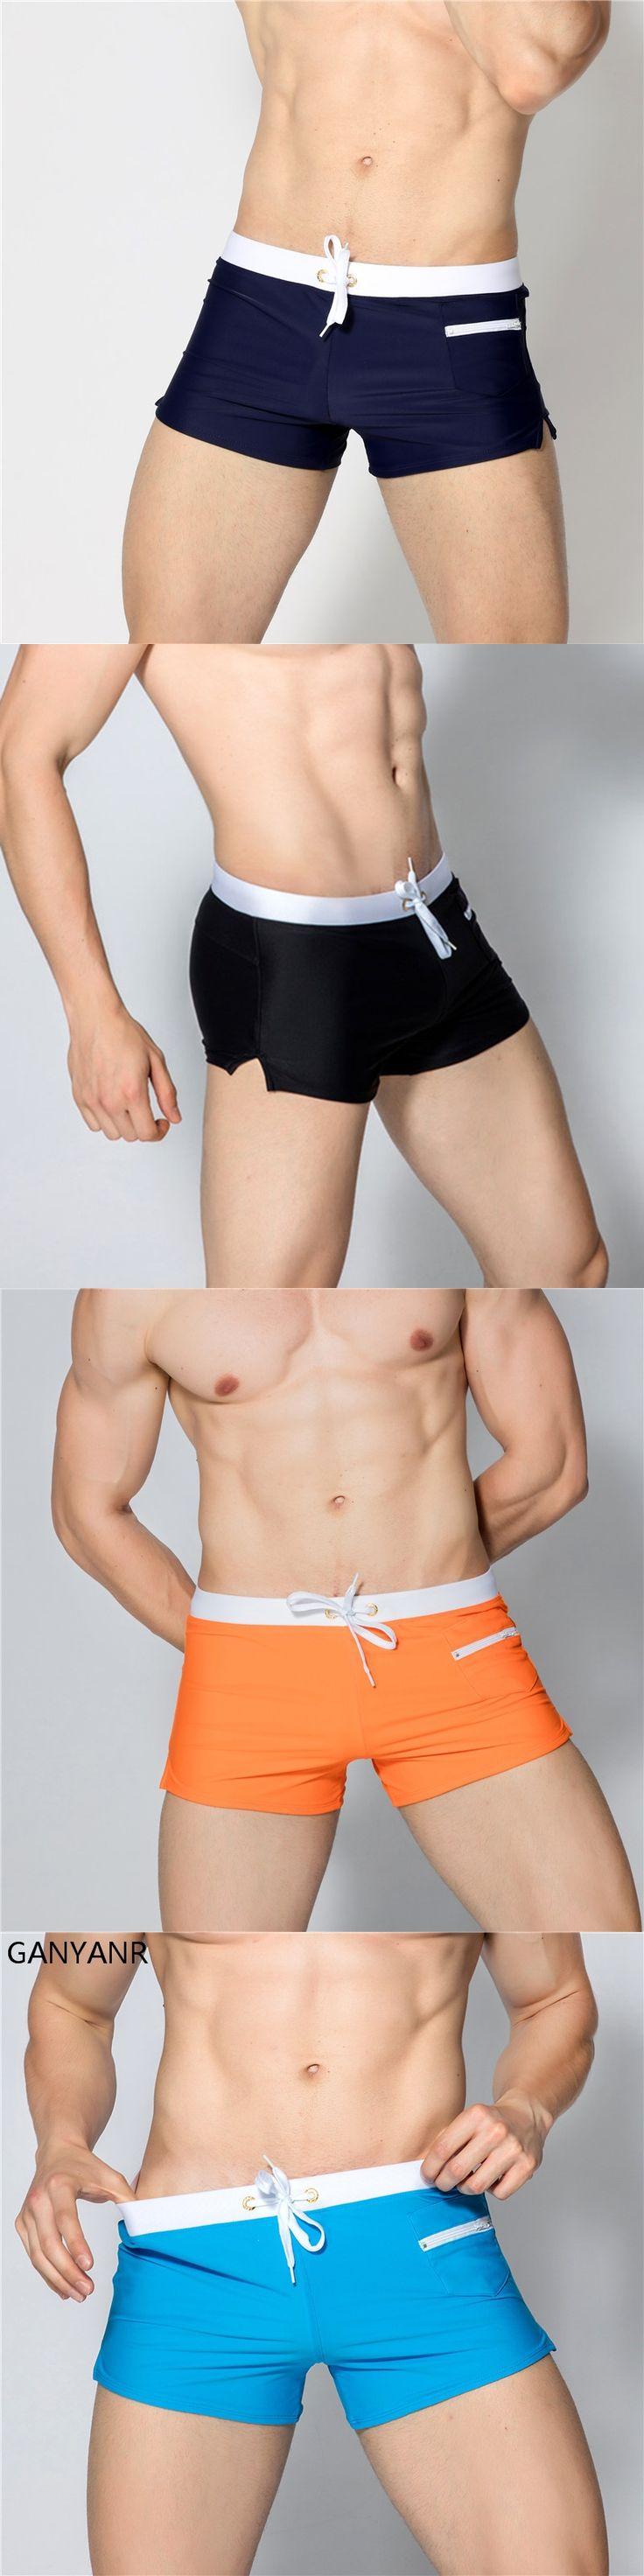 GANYANR Brand Gay Men Swimwear Brief Shorts Swimsuit Swimming Trunks Male Swim Surf Bathing Suit Sexy Pouch 2017 Low Waist Sunga